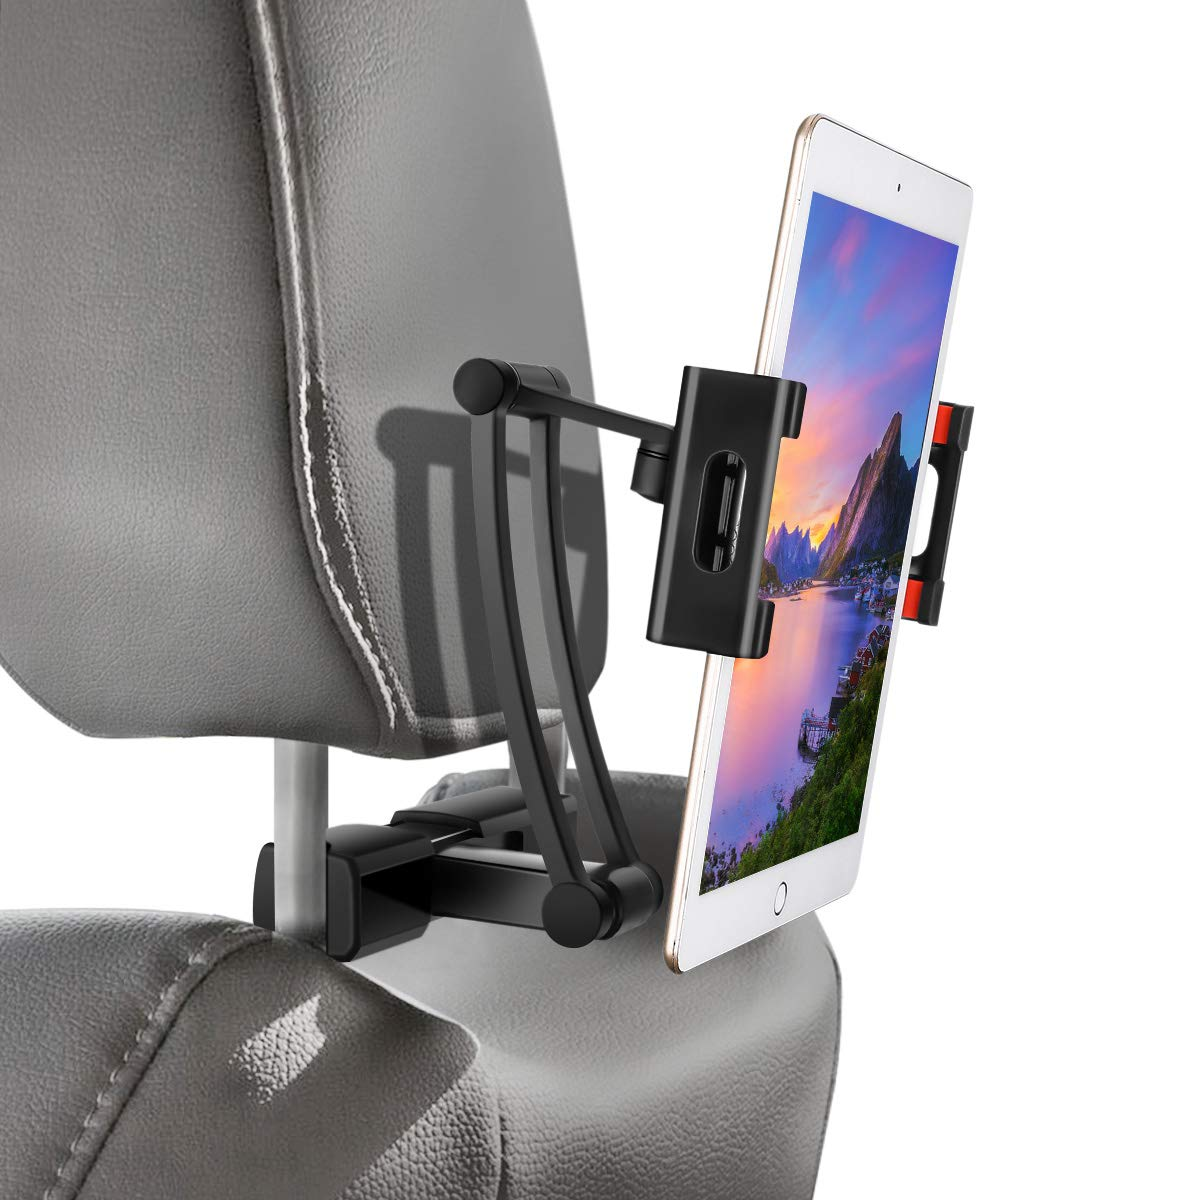 "Car Headrest Mount, Sawake Headrest Tablet Mount, Universal Tablet Holder for Car Backseat, for 5"" to 14"" iPad/Tablet/Smartphone/Nintendo Switch"